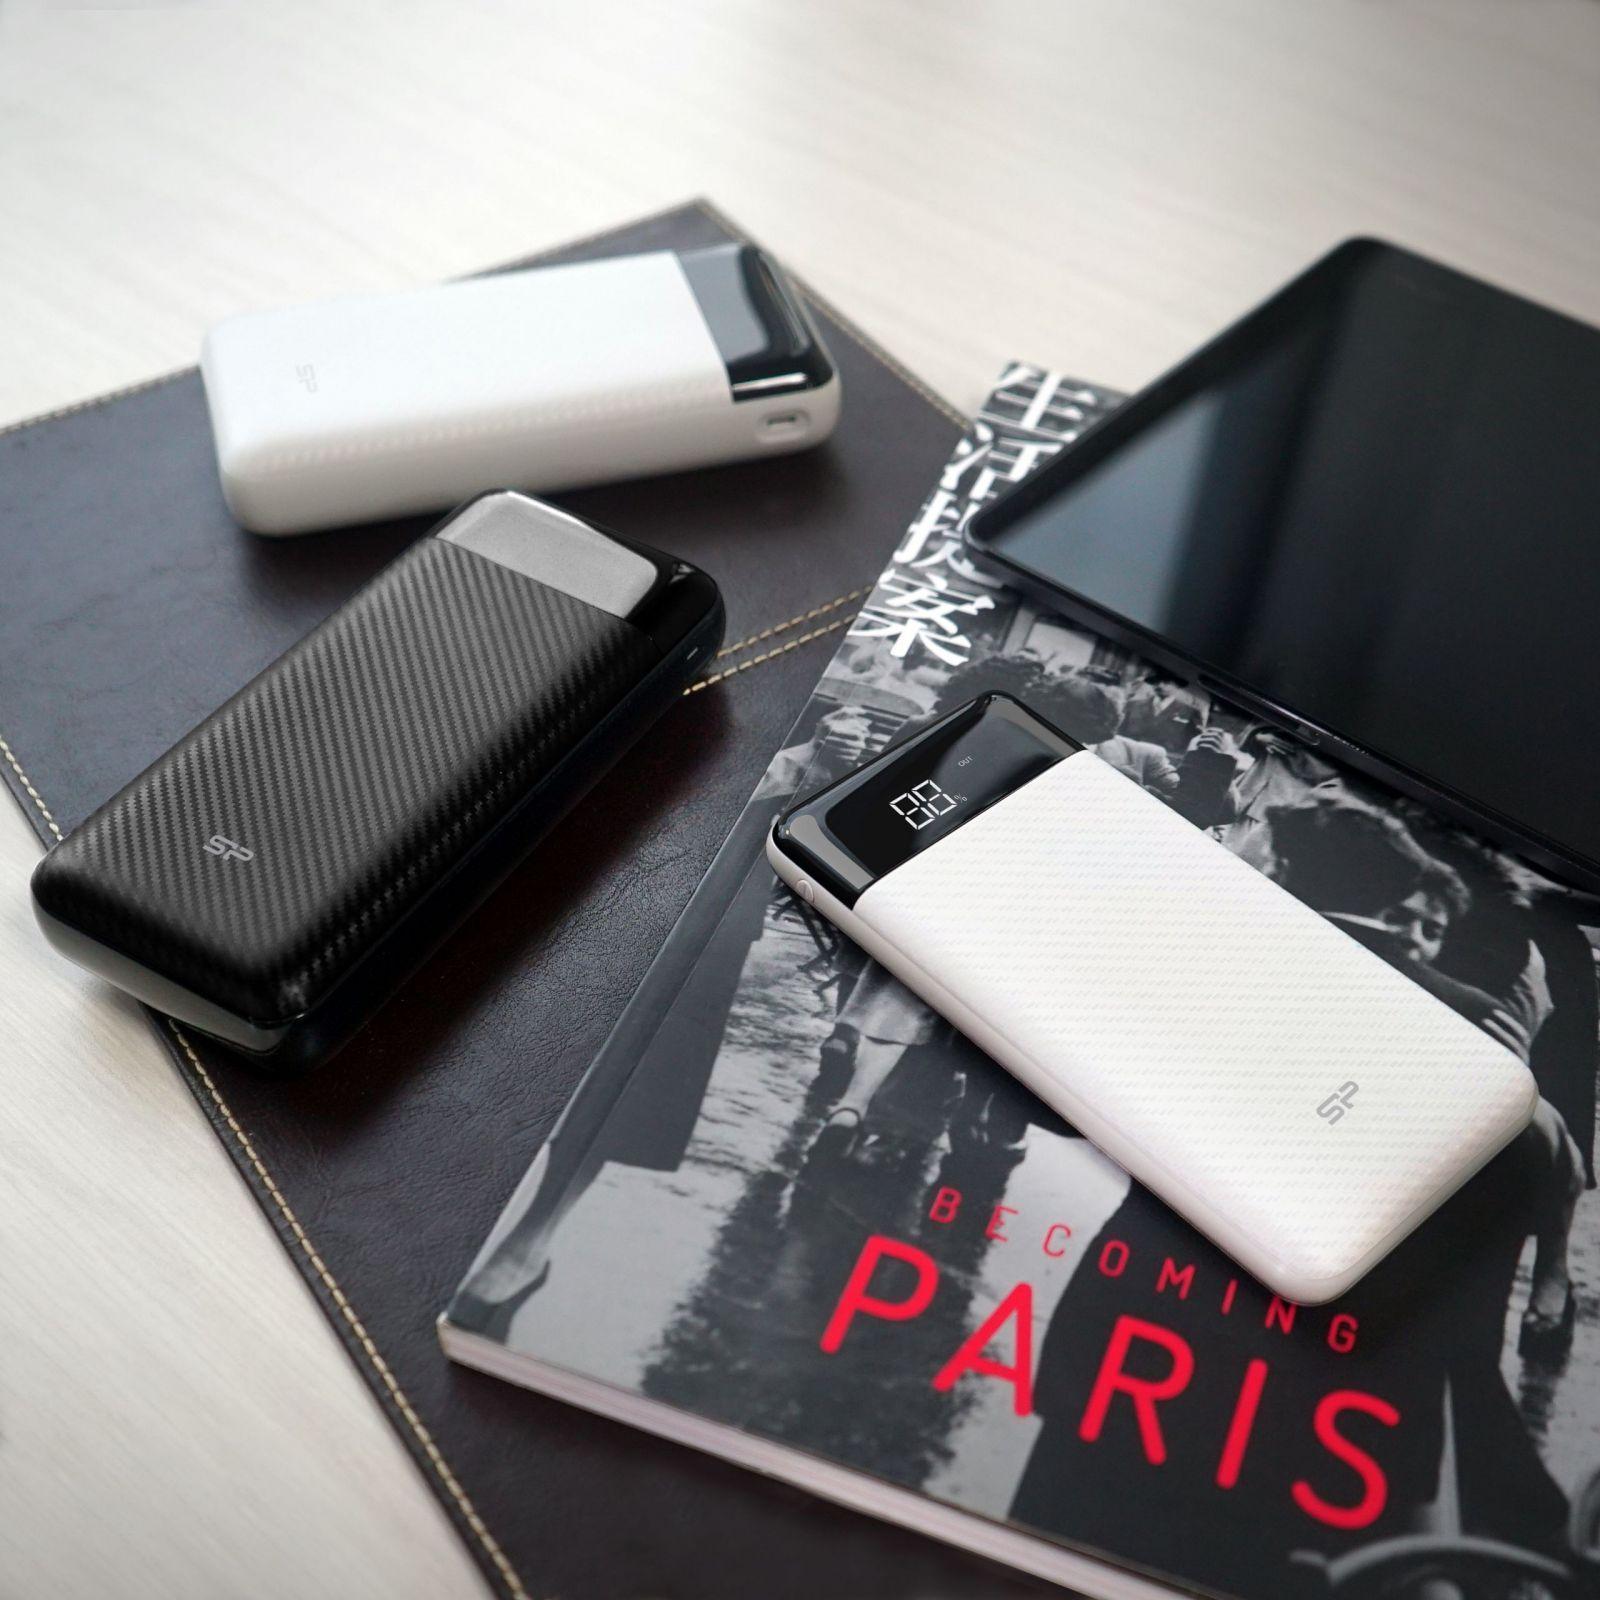 Silicon Power выпустил аж 5 новых внешних аккумуляторов (ps lifestyle 2 scaled)